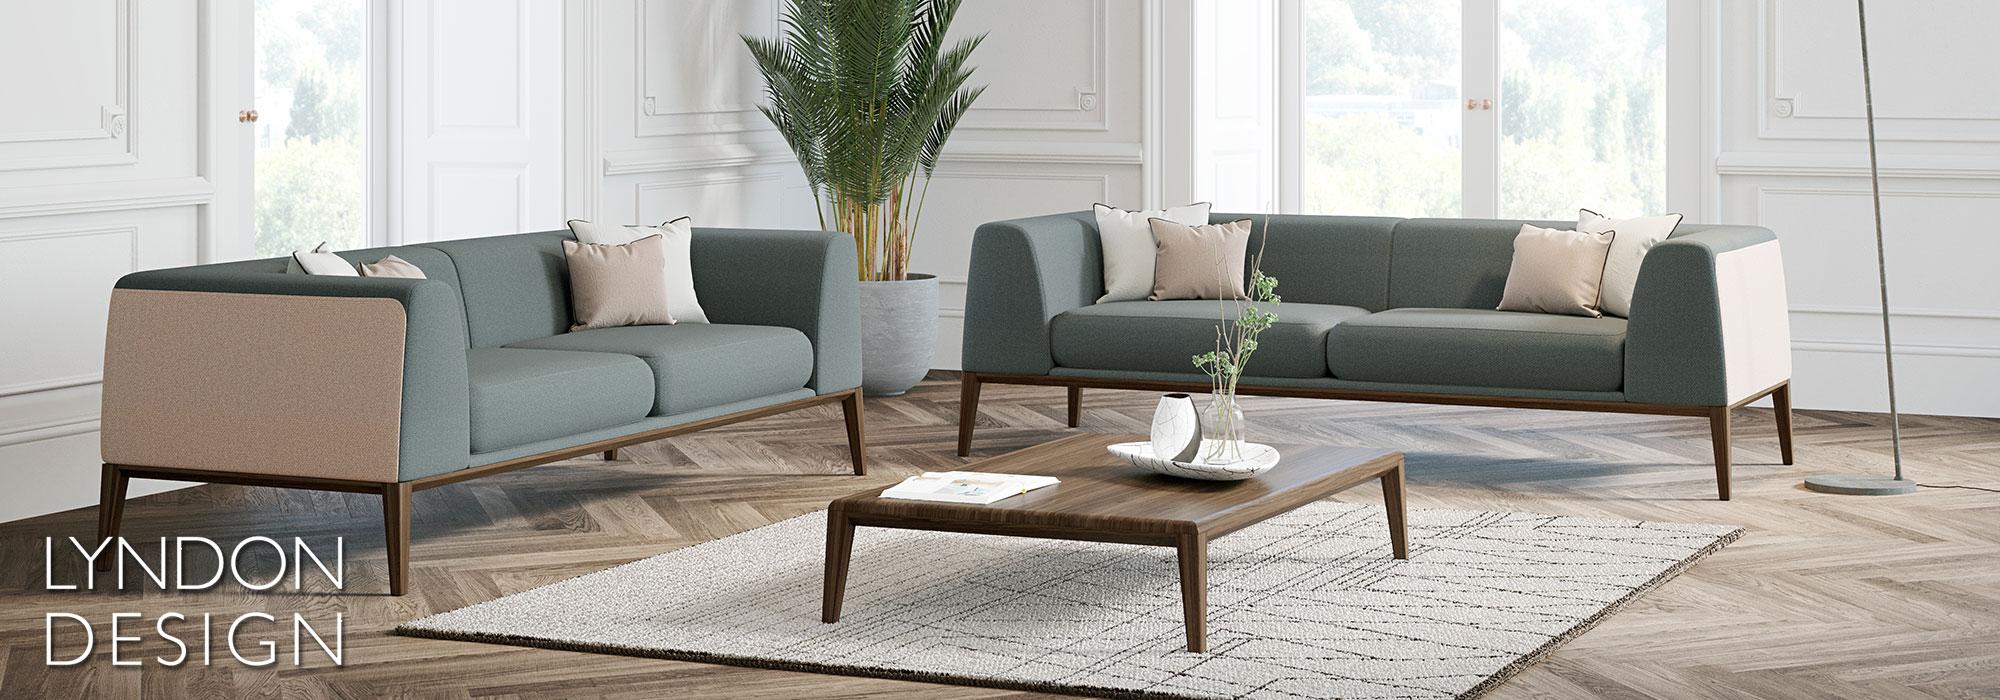 Lyndon Design Maysa Collection